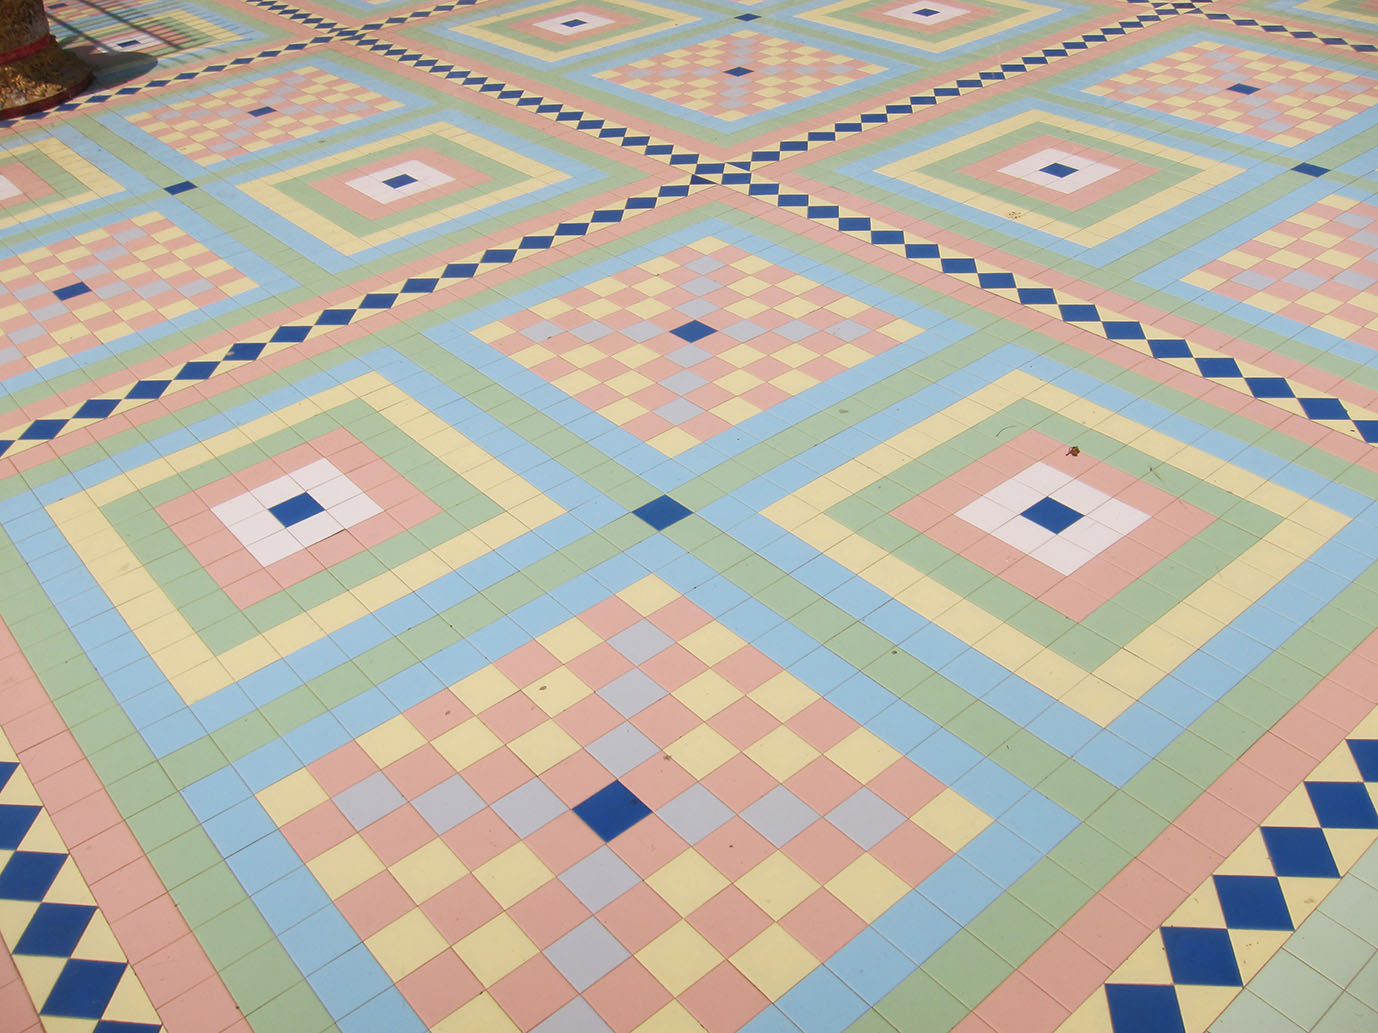 Pastel6-Tile2.jpg